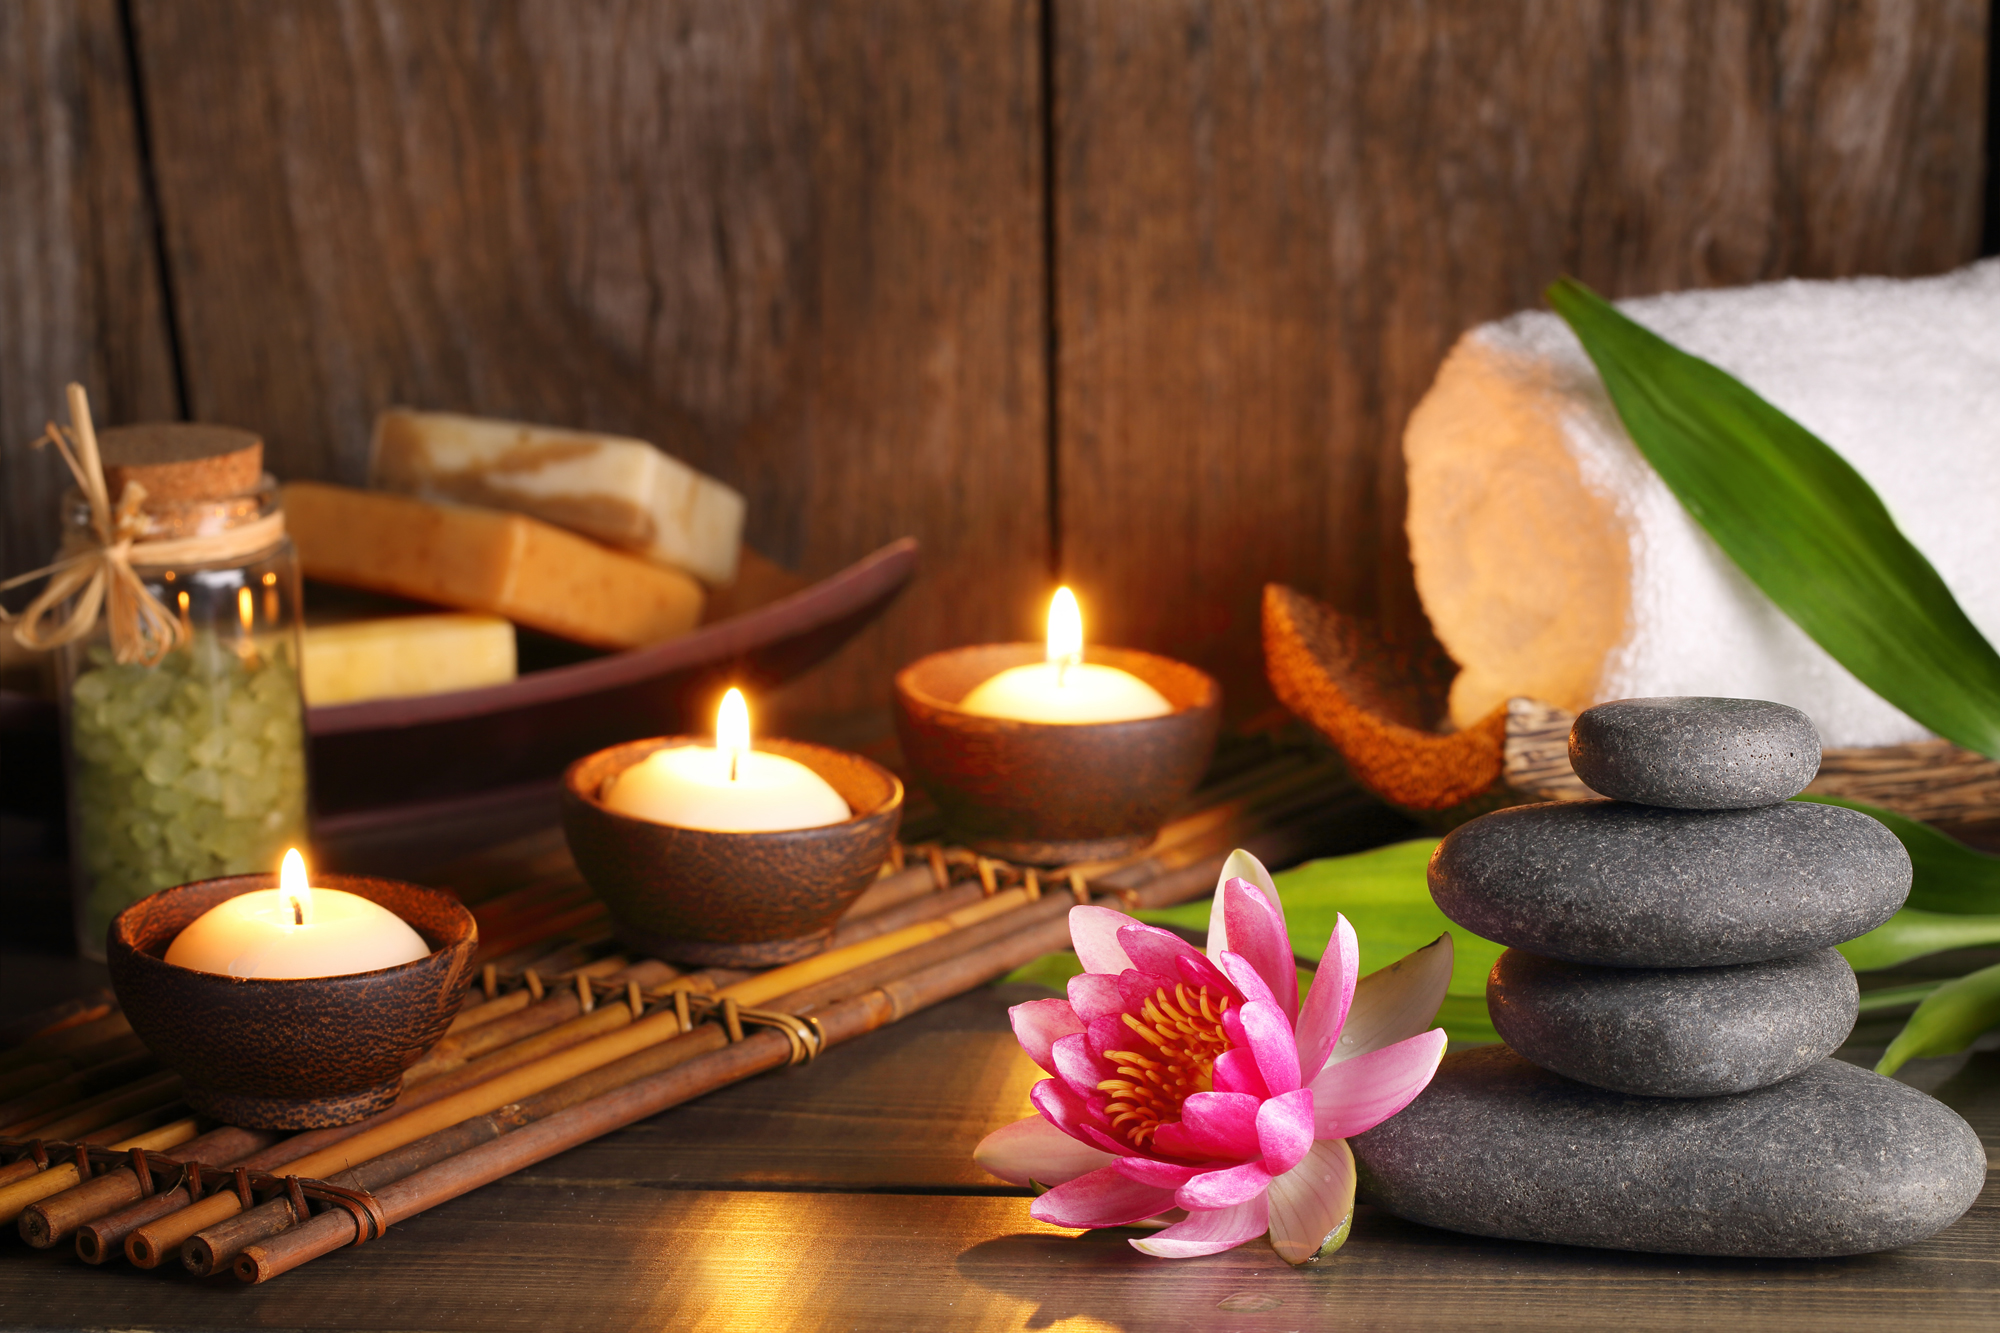 gommage et massage bougie